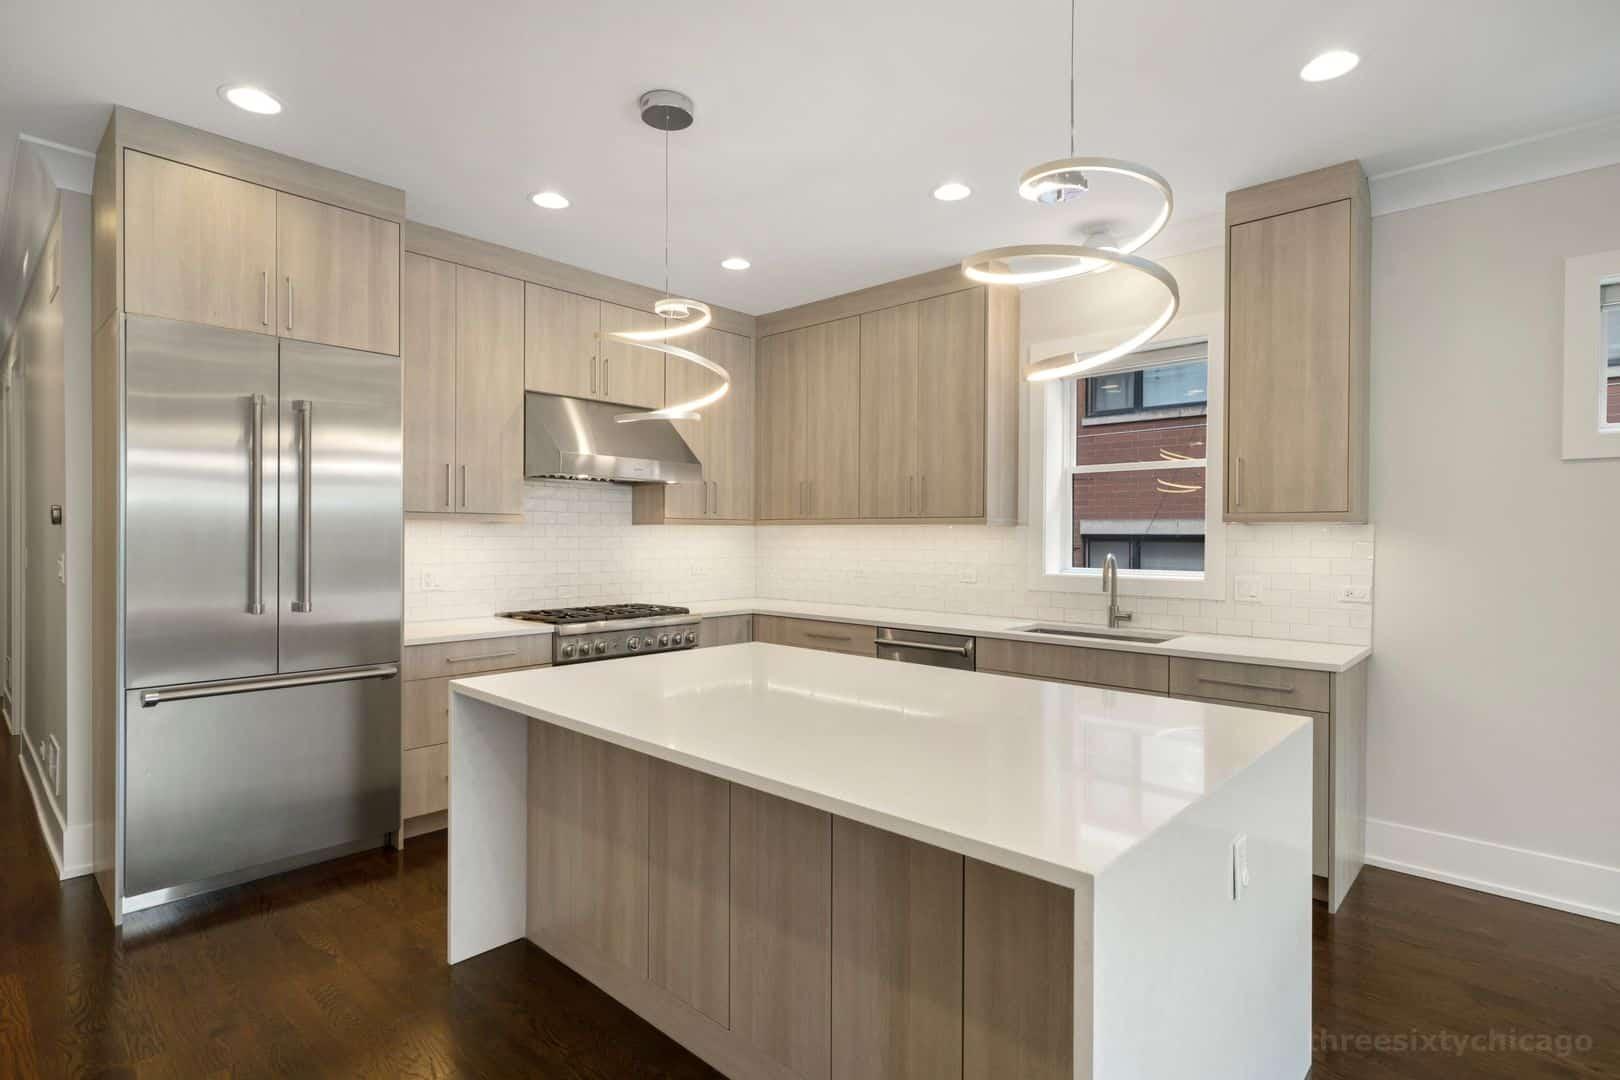 2018 W Le Moyne Street Unit 2E Chicago, IL 60622 - Kitchen